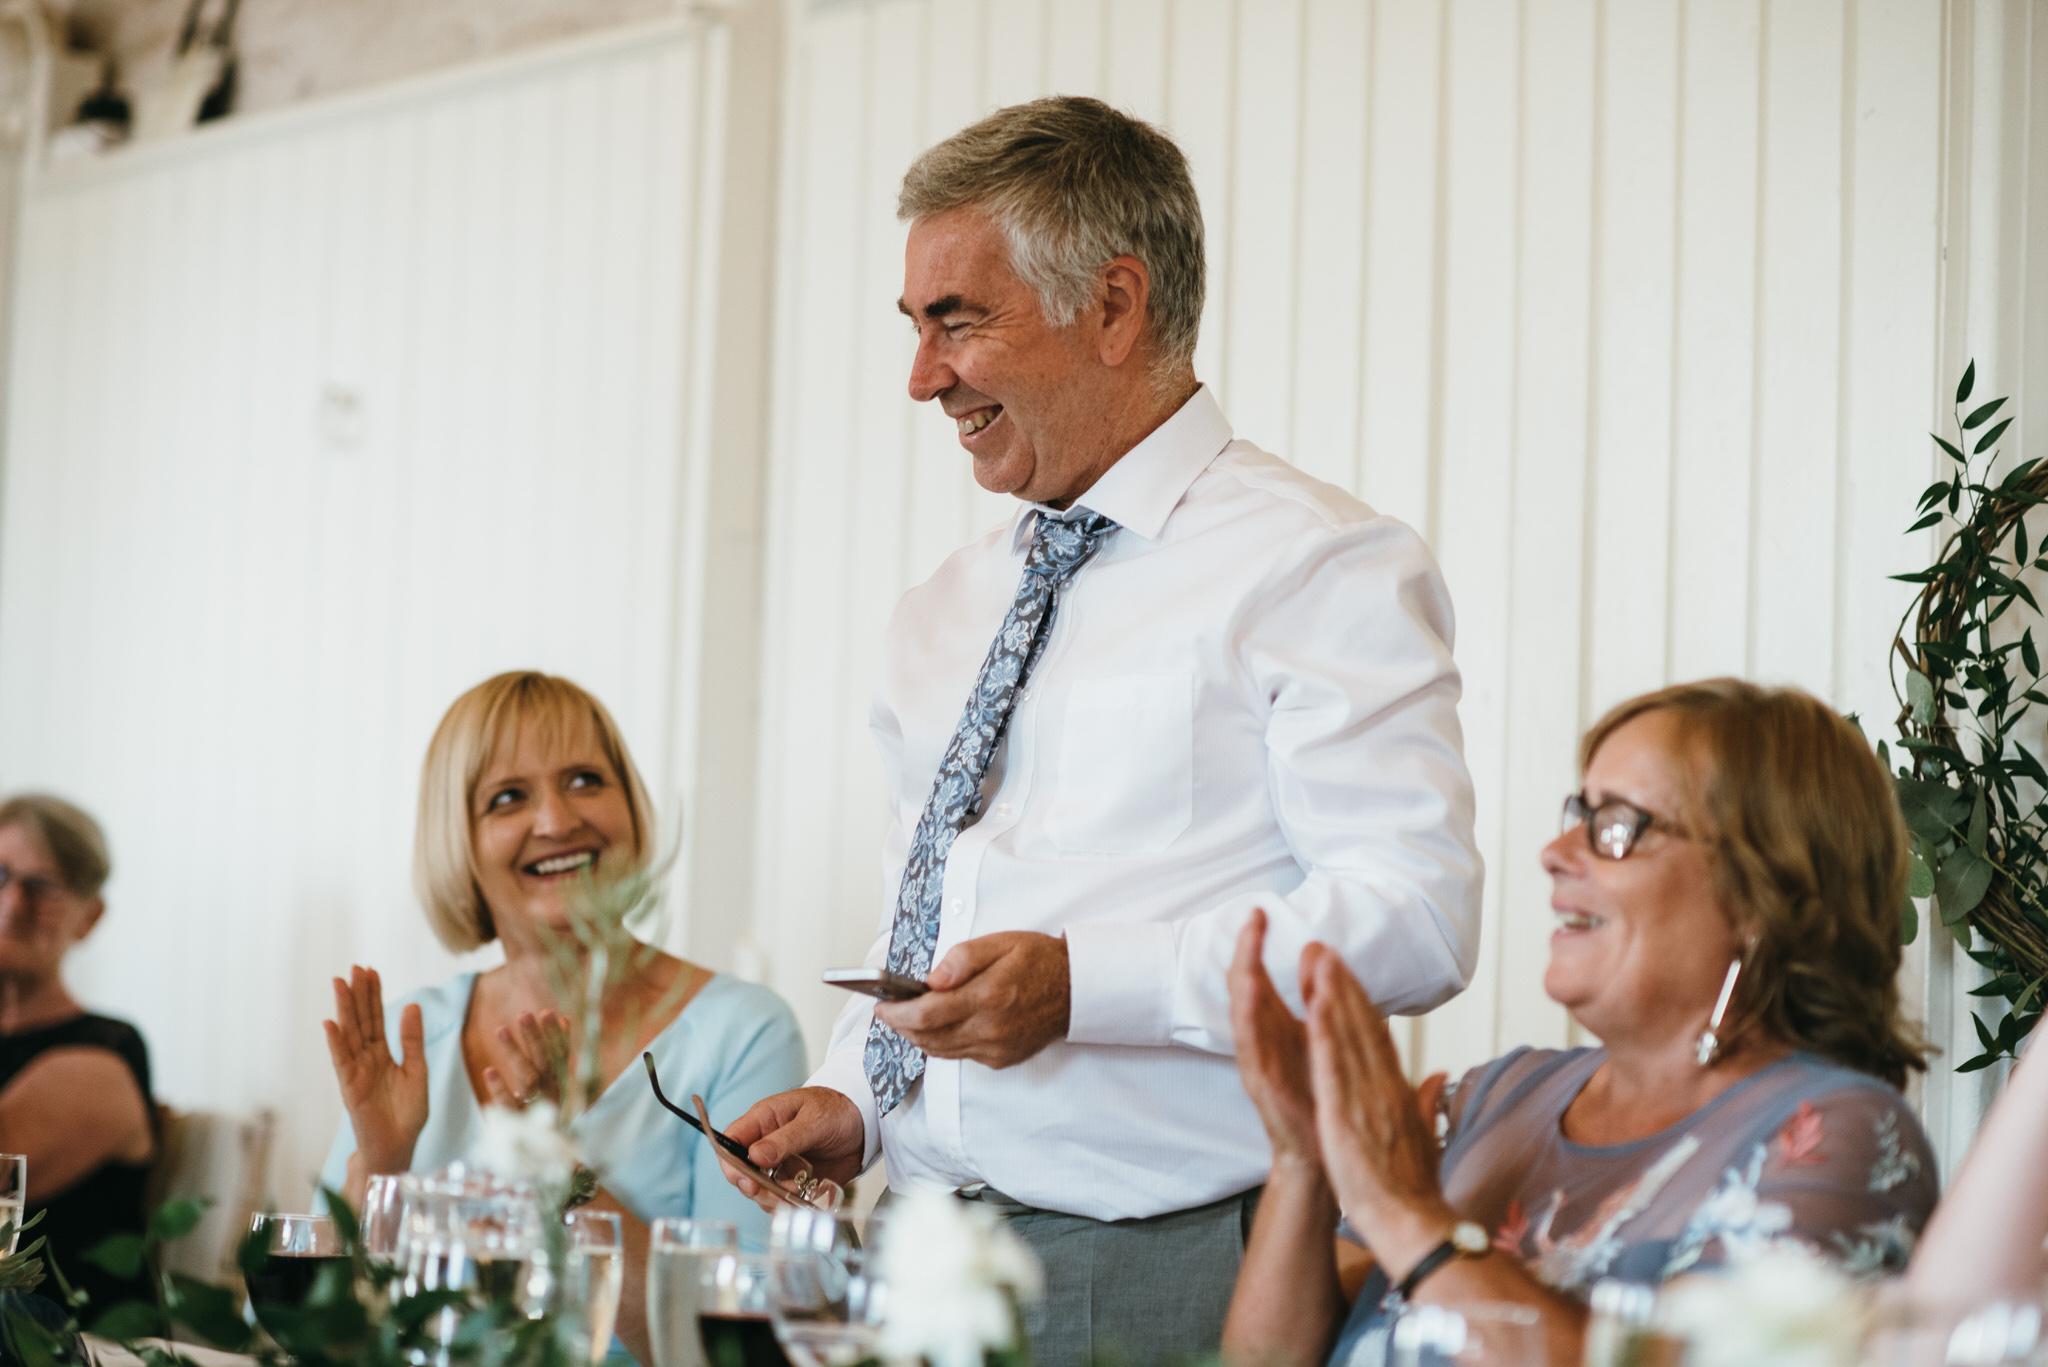 Hestercombe gardens wedding speeches